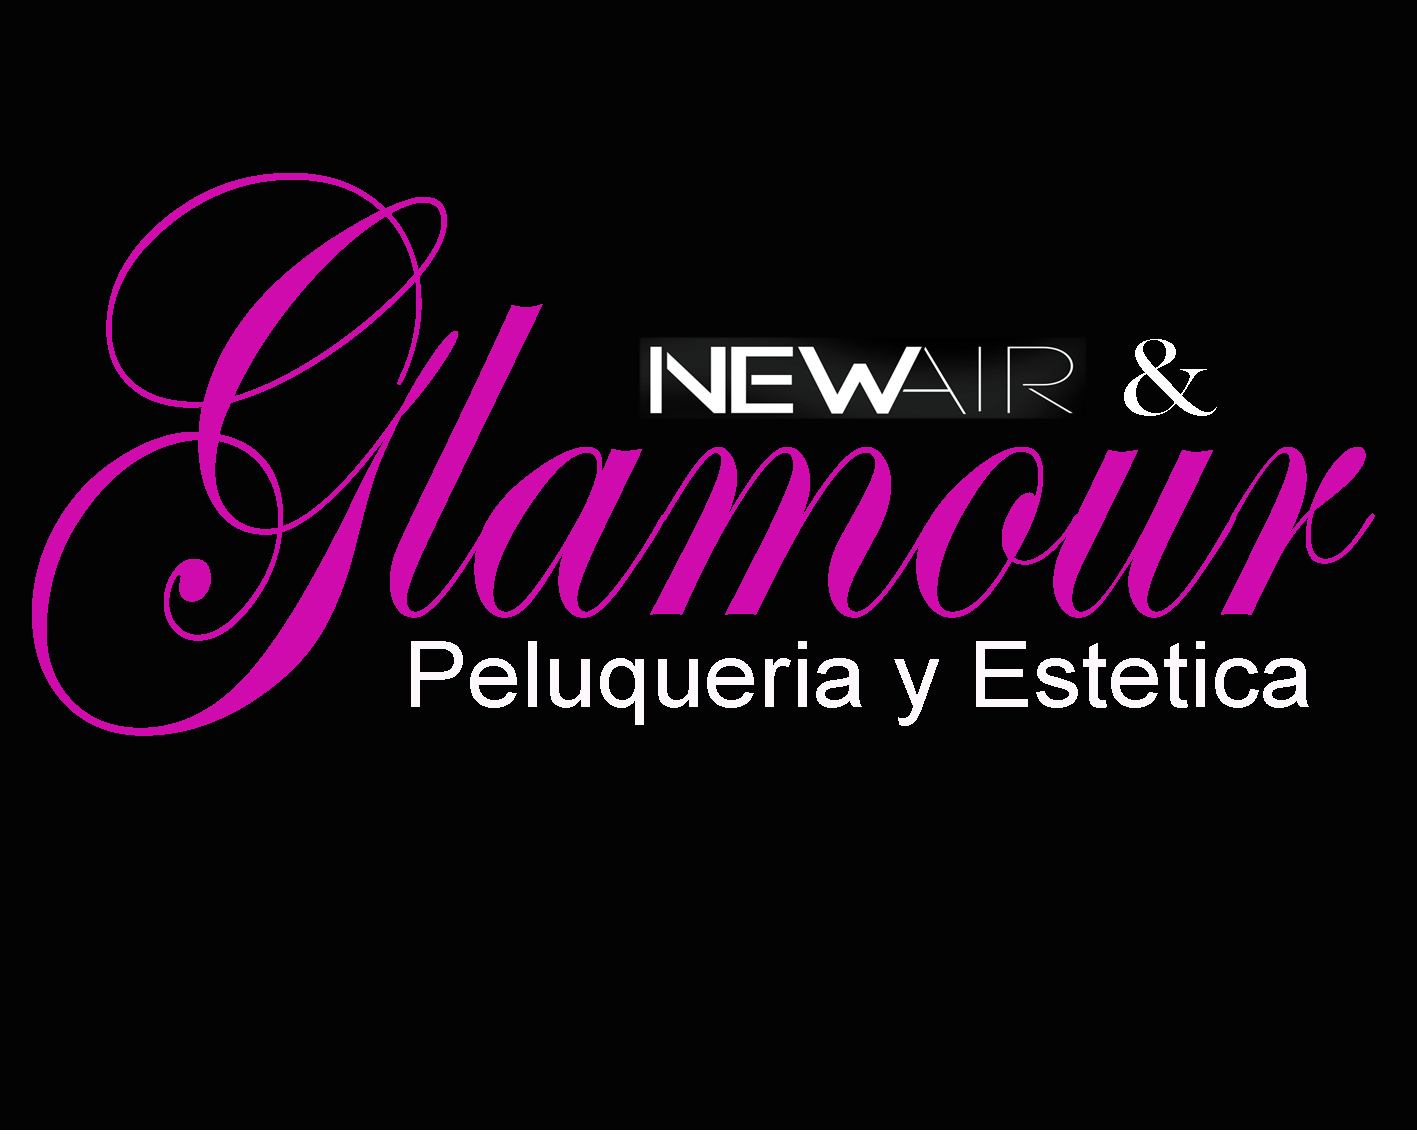 Newair glamour asociaci n de vecinos independiente de - Nombres de centros de belleza ...